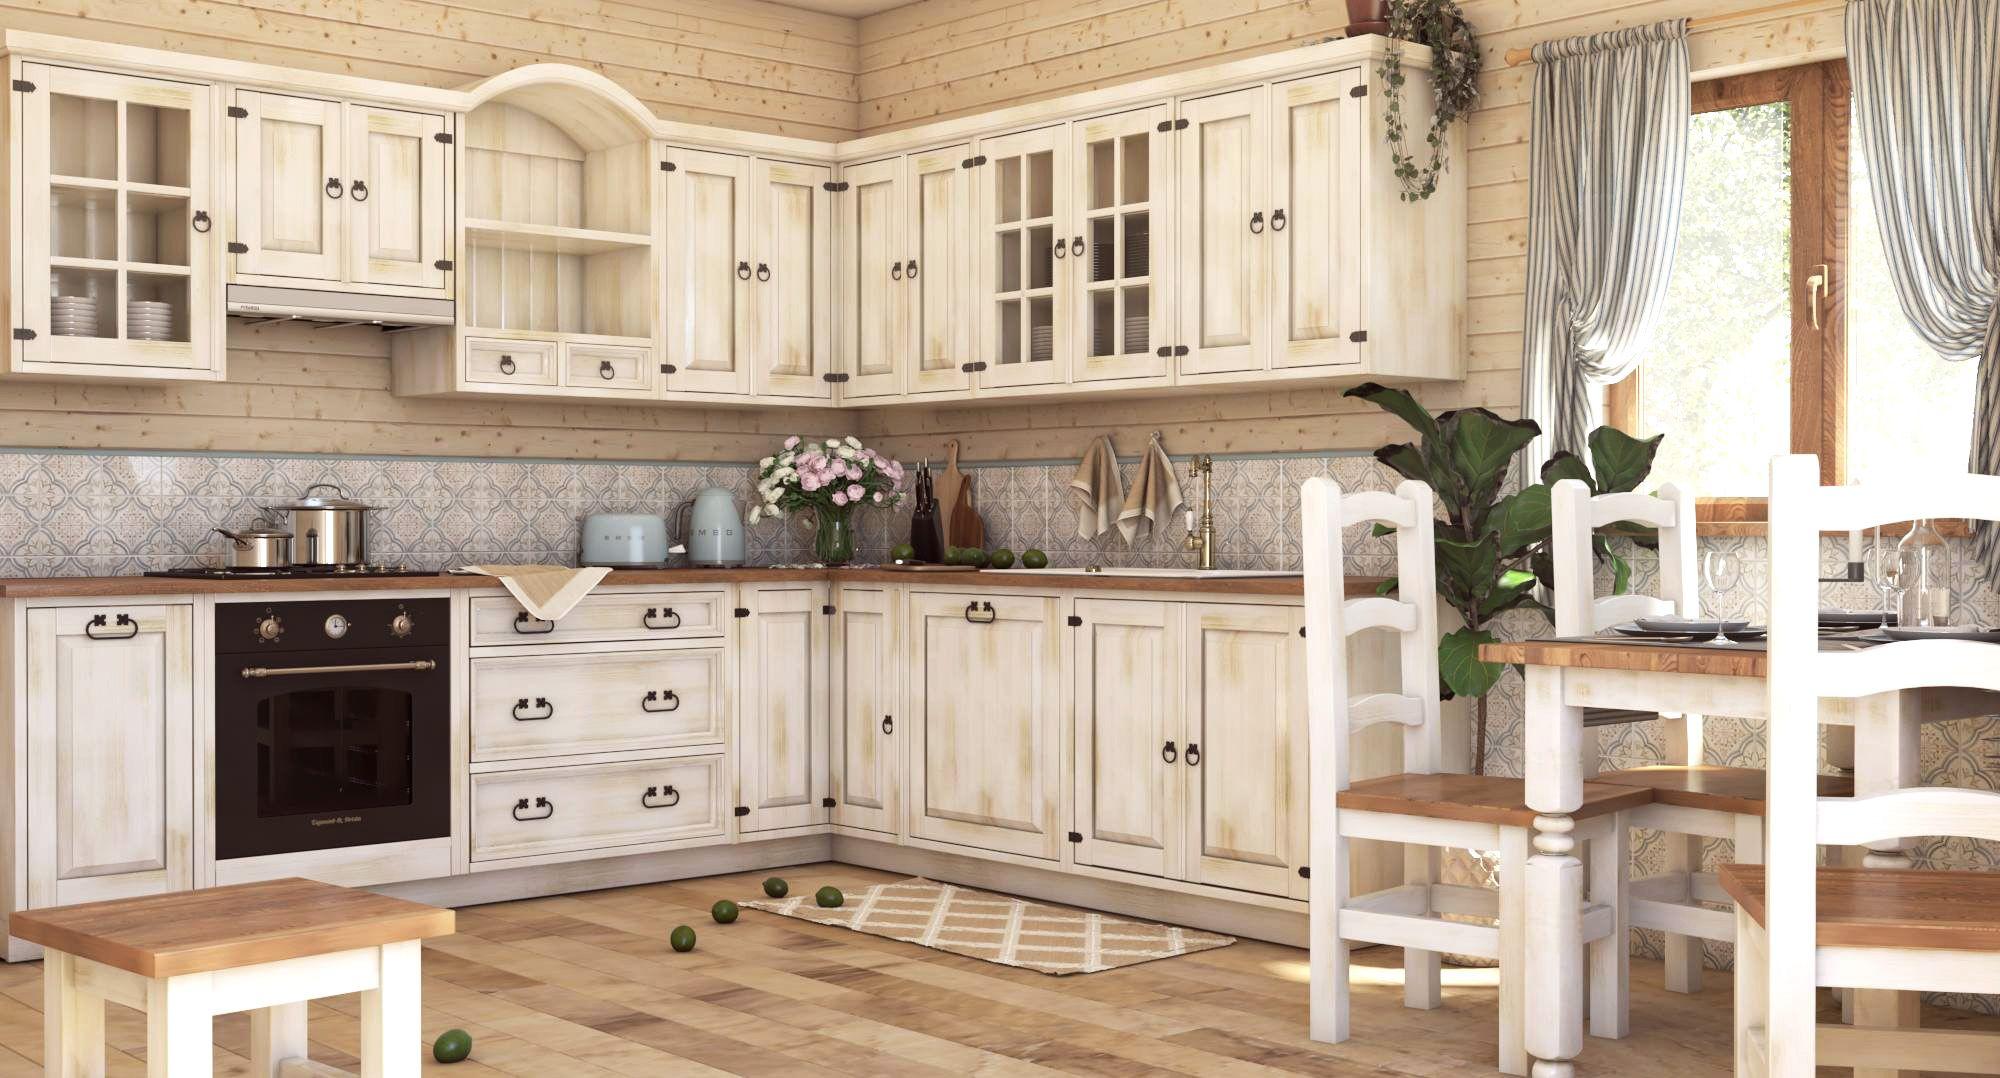 Biale Meble Kuchenne Rustic Kitchen Rustic Kitchen Cabinets Rustic Modern Kitchen